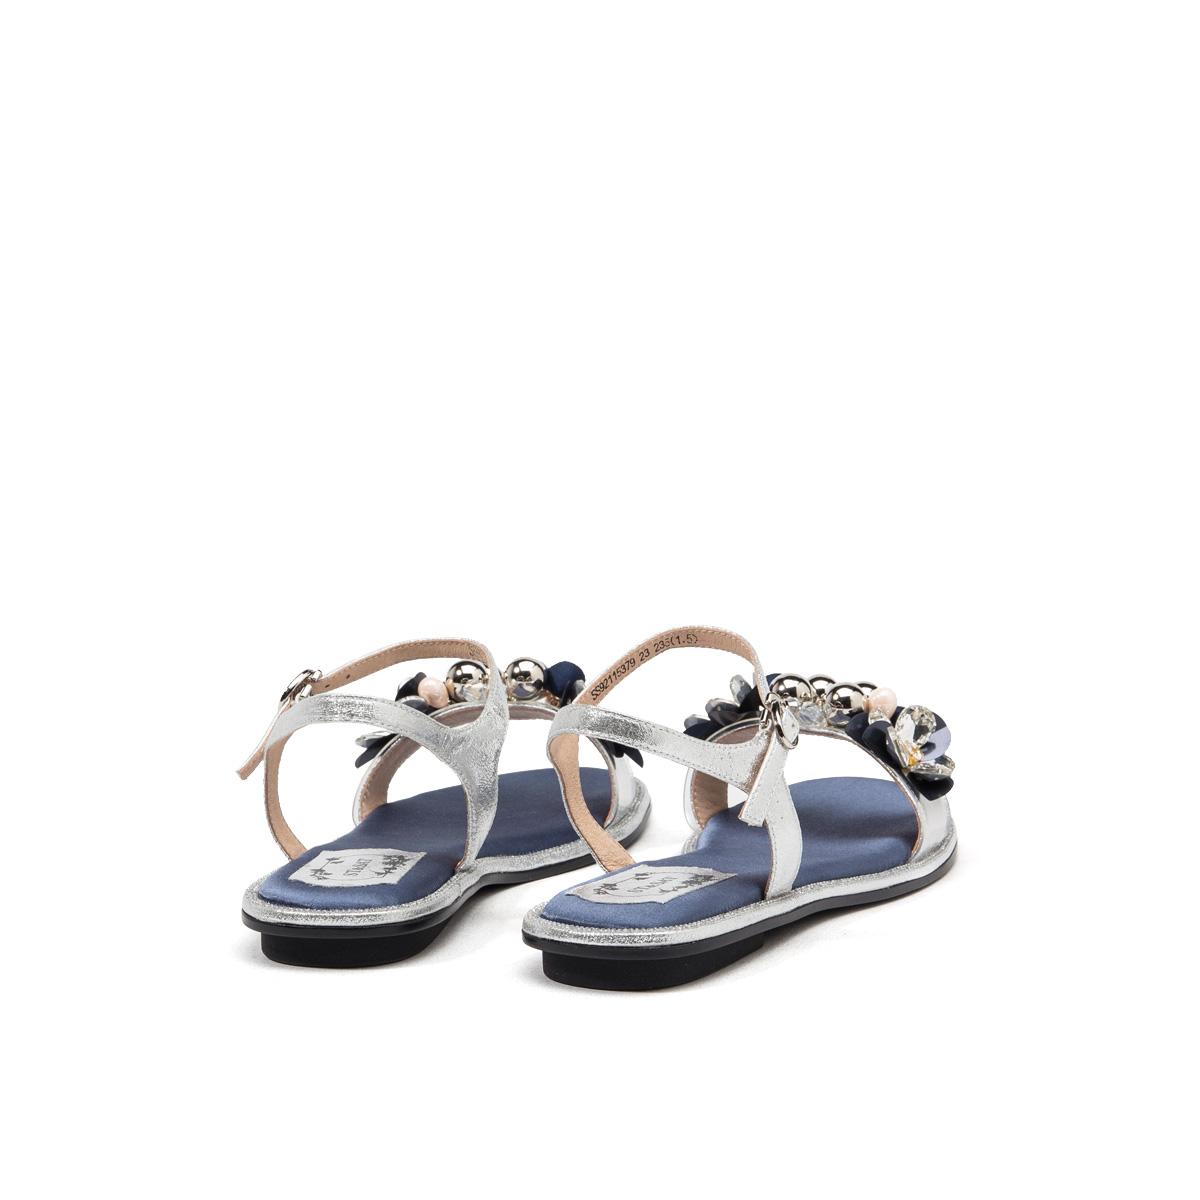 SS92115379 新款夏季女平底鞋一字带凉鞋女 2019 星期六凉鞋 Sat & St